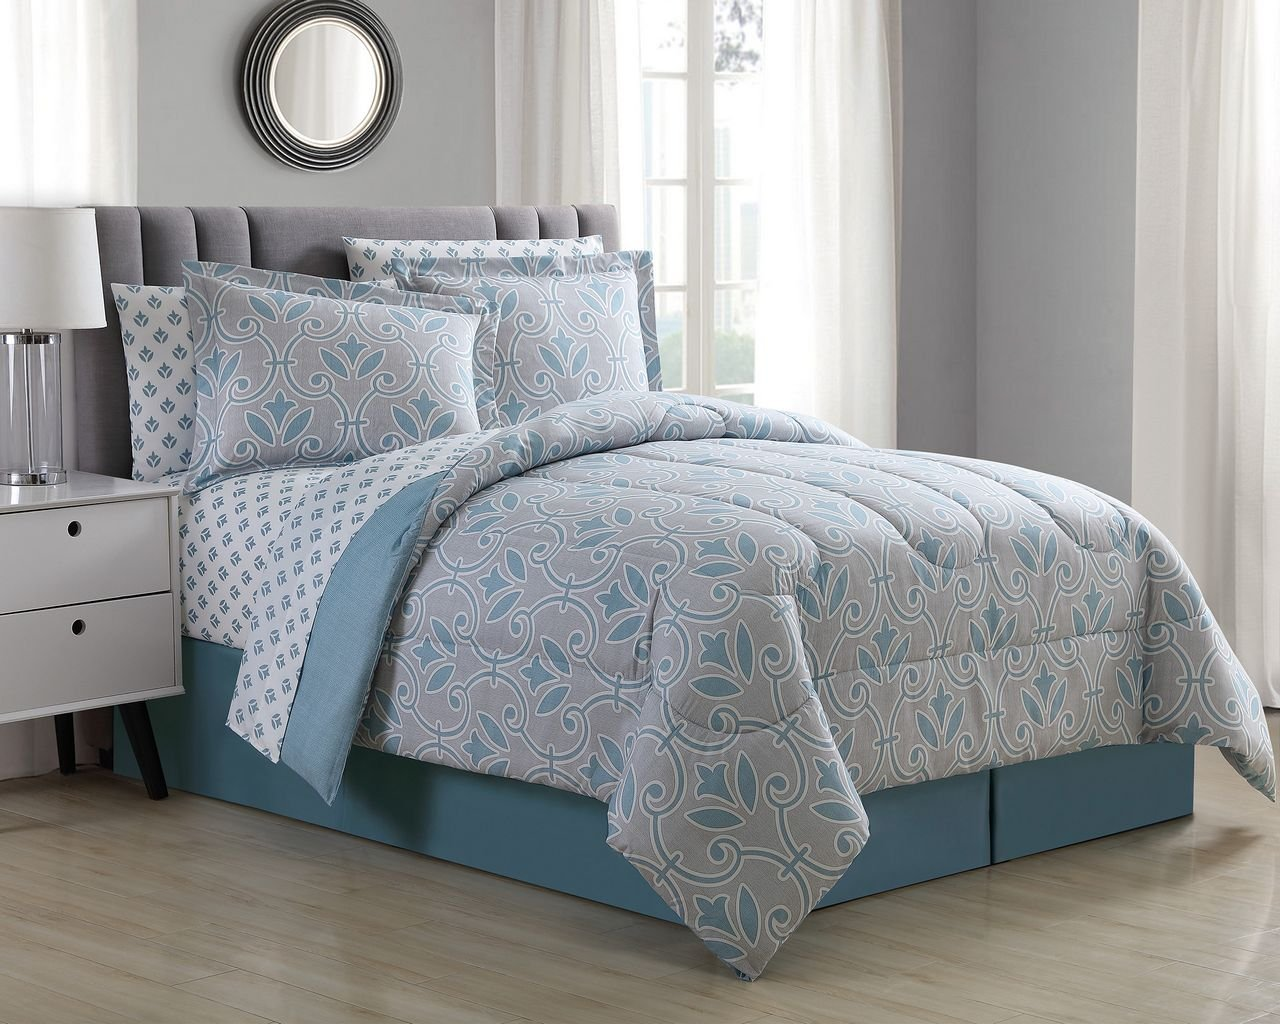 KingLinen 8 Piece Daventry Spa Blue/Taupe Comforter Set Queen